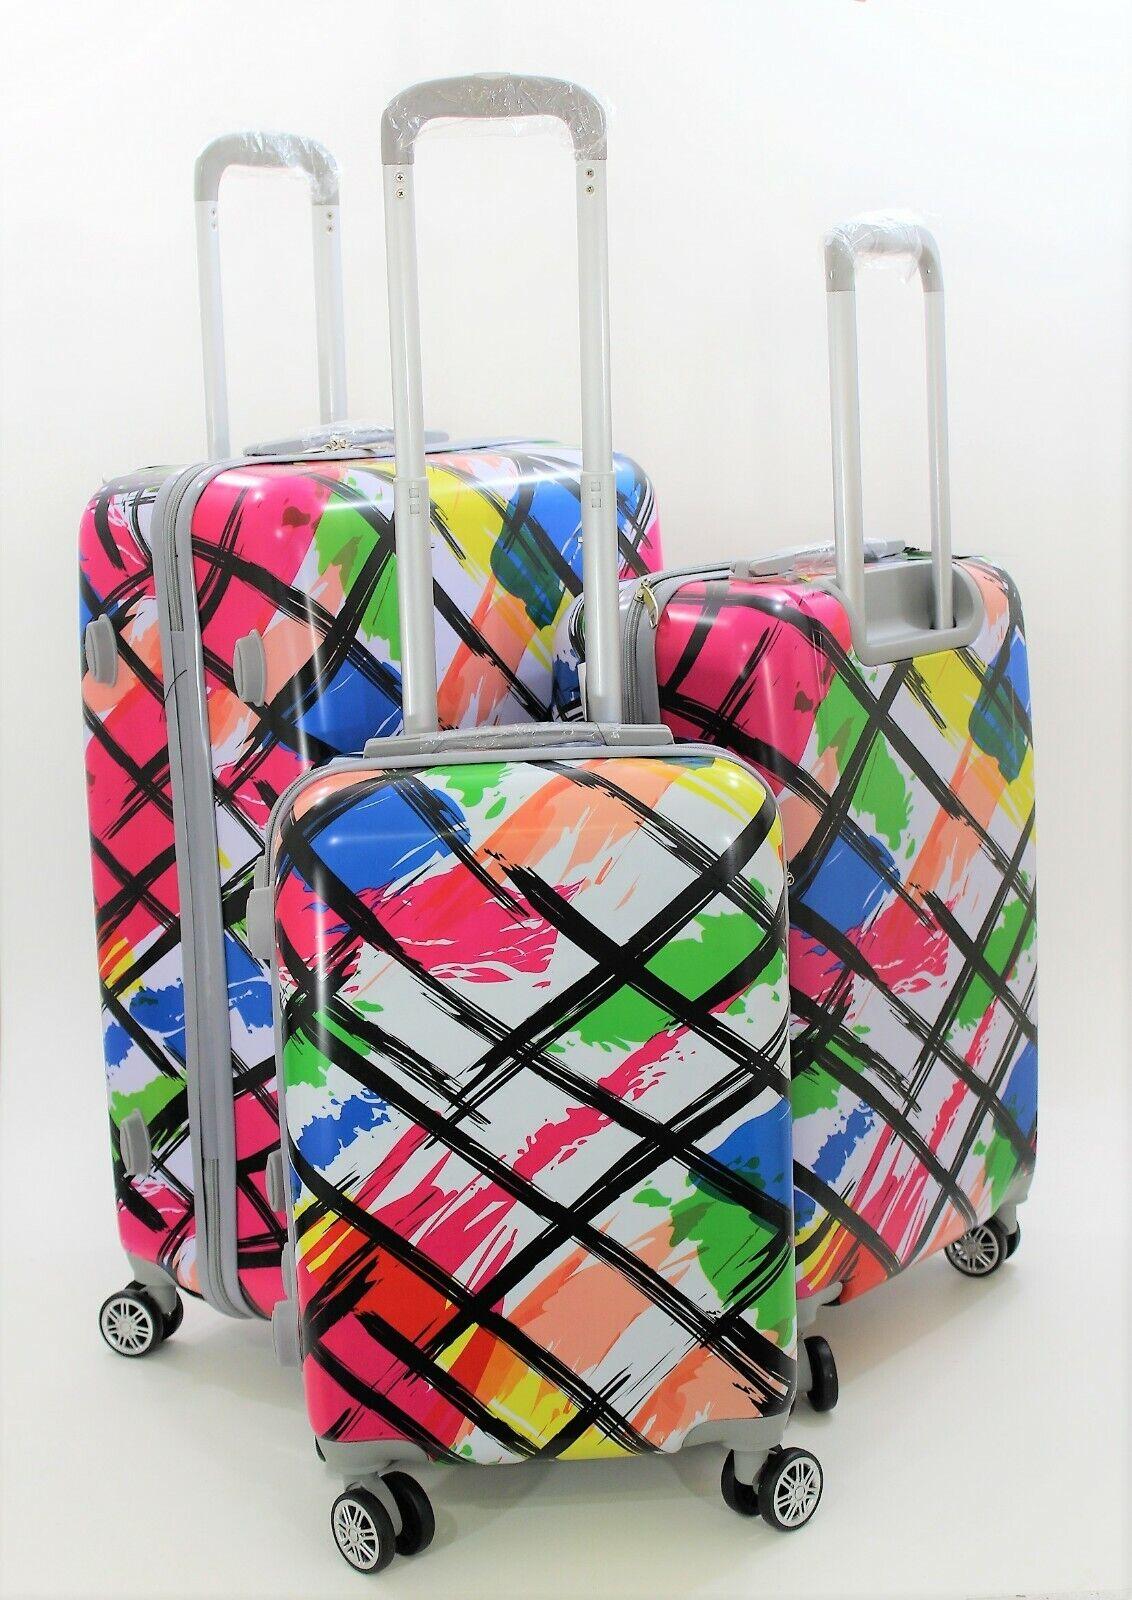 Ikase Hardside Spinner Luggage Bears